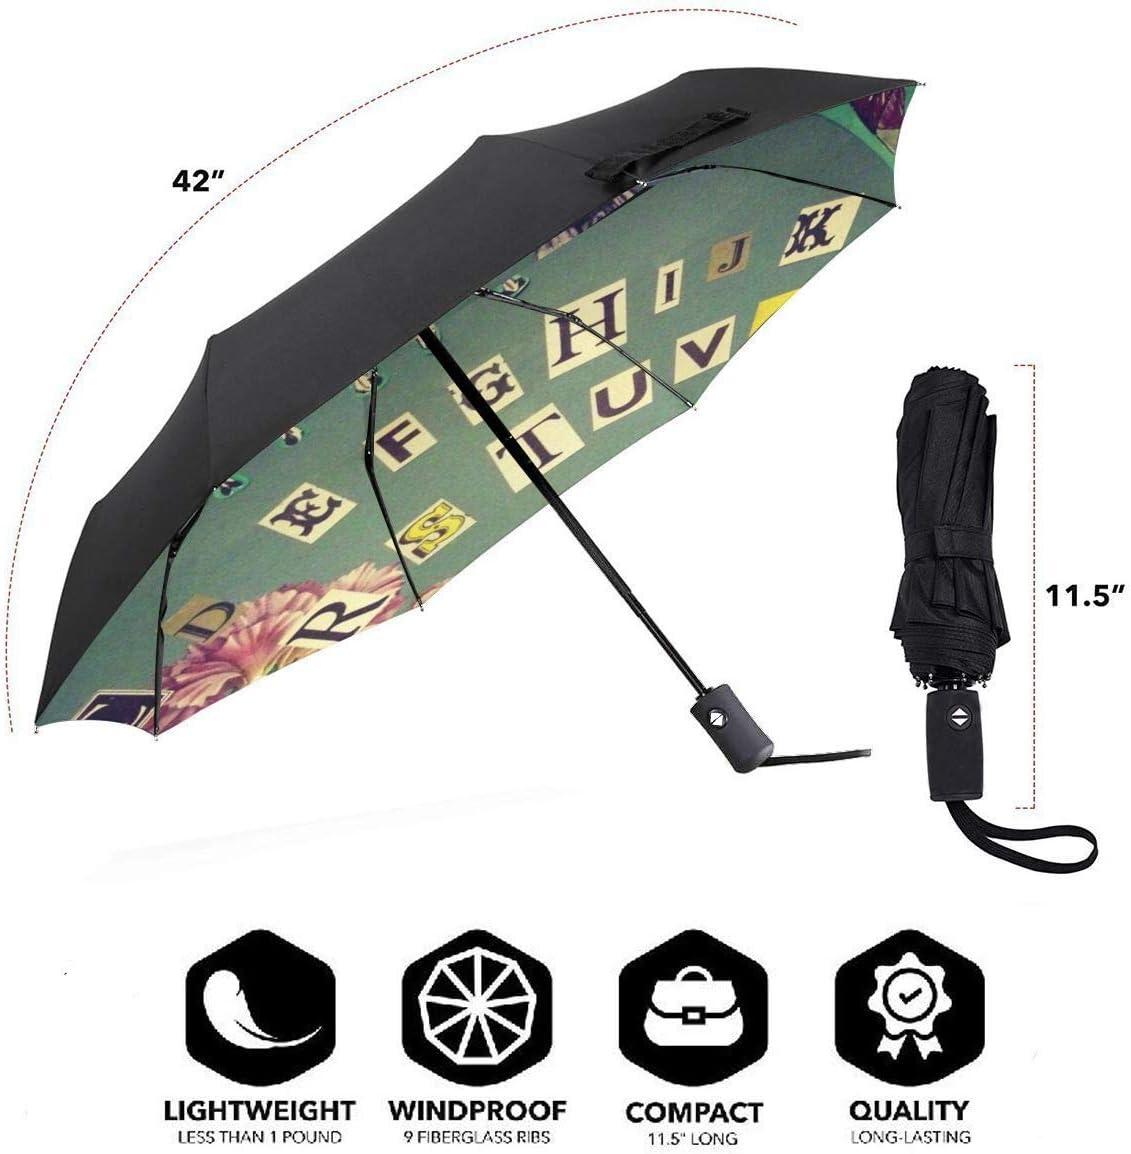 Ouija Board Skull Colorful Travel Umbrella Lightweight Compact Parasol Canopy Ergonomic With UV Protection For Sun Rain Auto Open And Close